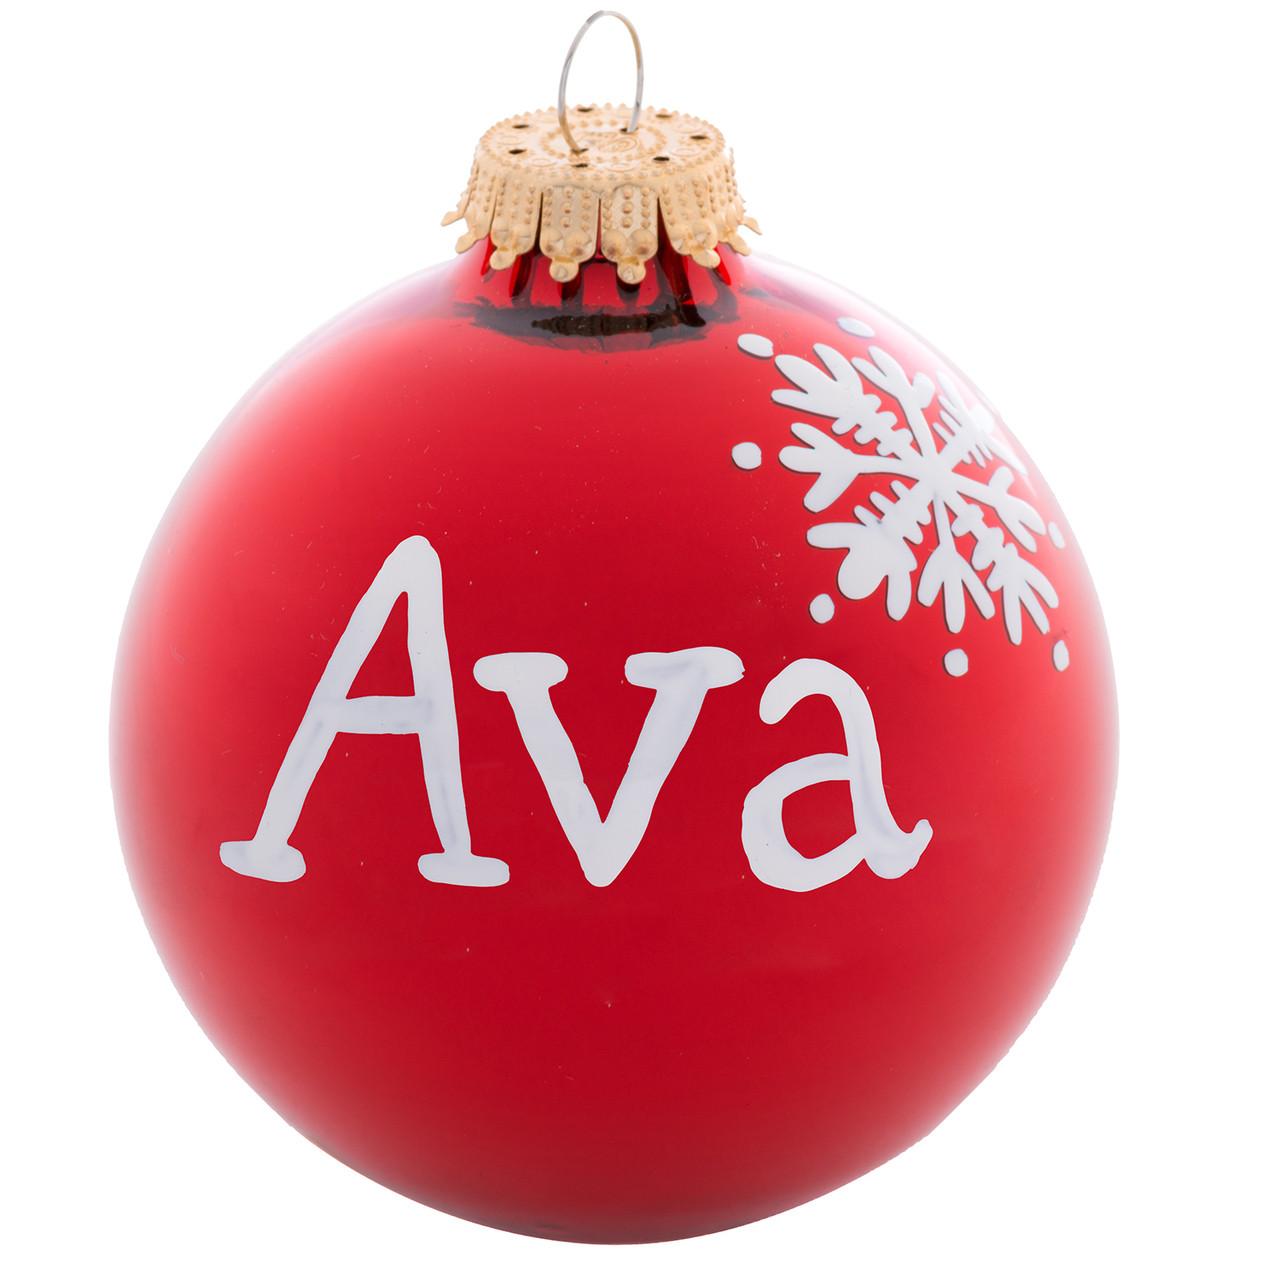 Personalized Christmas Name Balls & Ornaments Canada | RetroFestive.ca